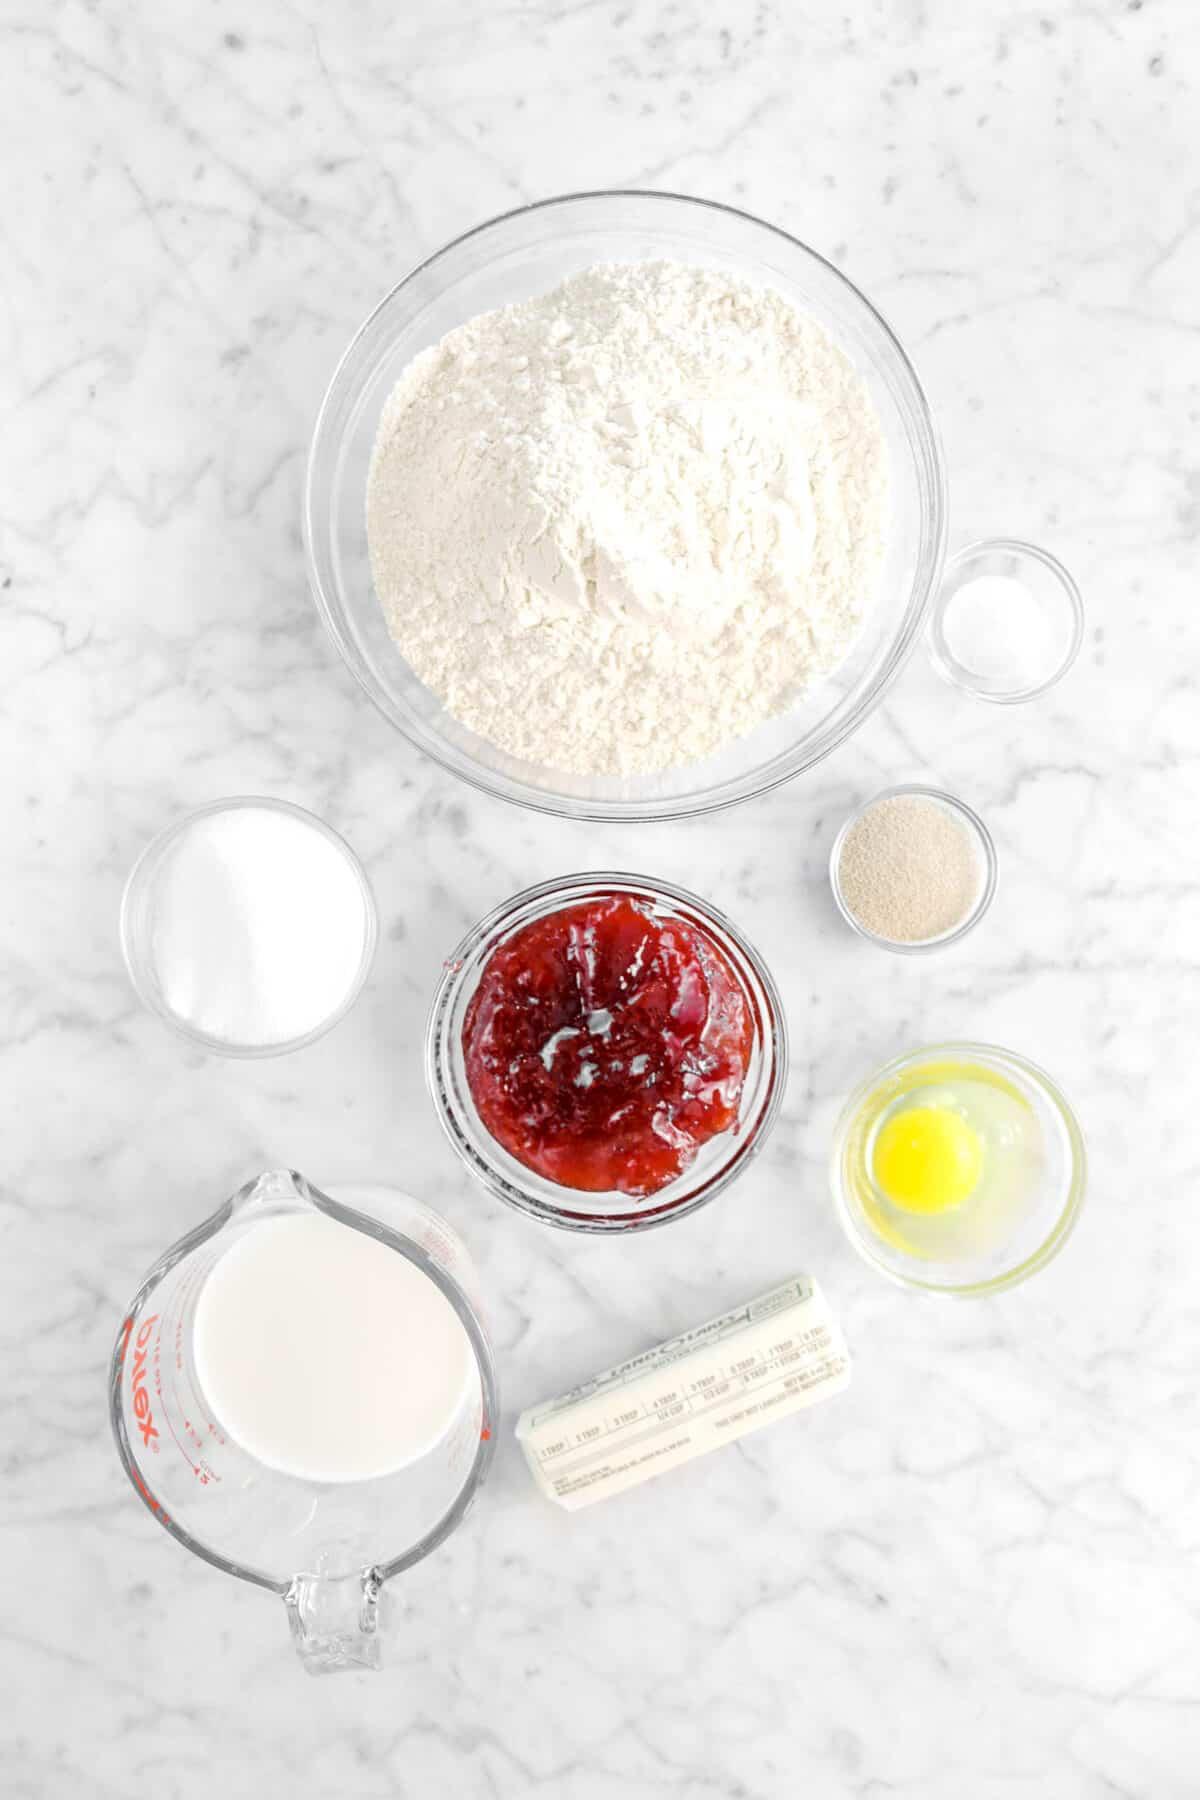 flour, salt, yeast, sugar, strawberry jam, egg, flour, and milk on marble counter